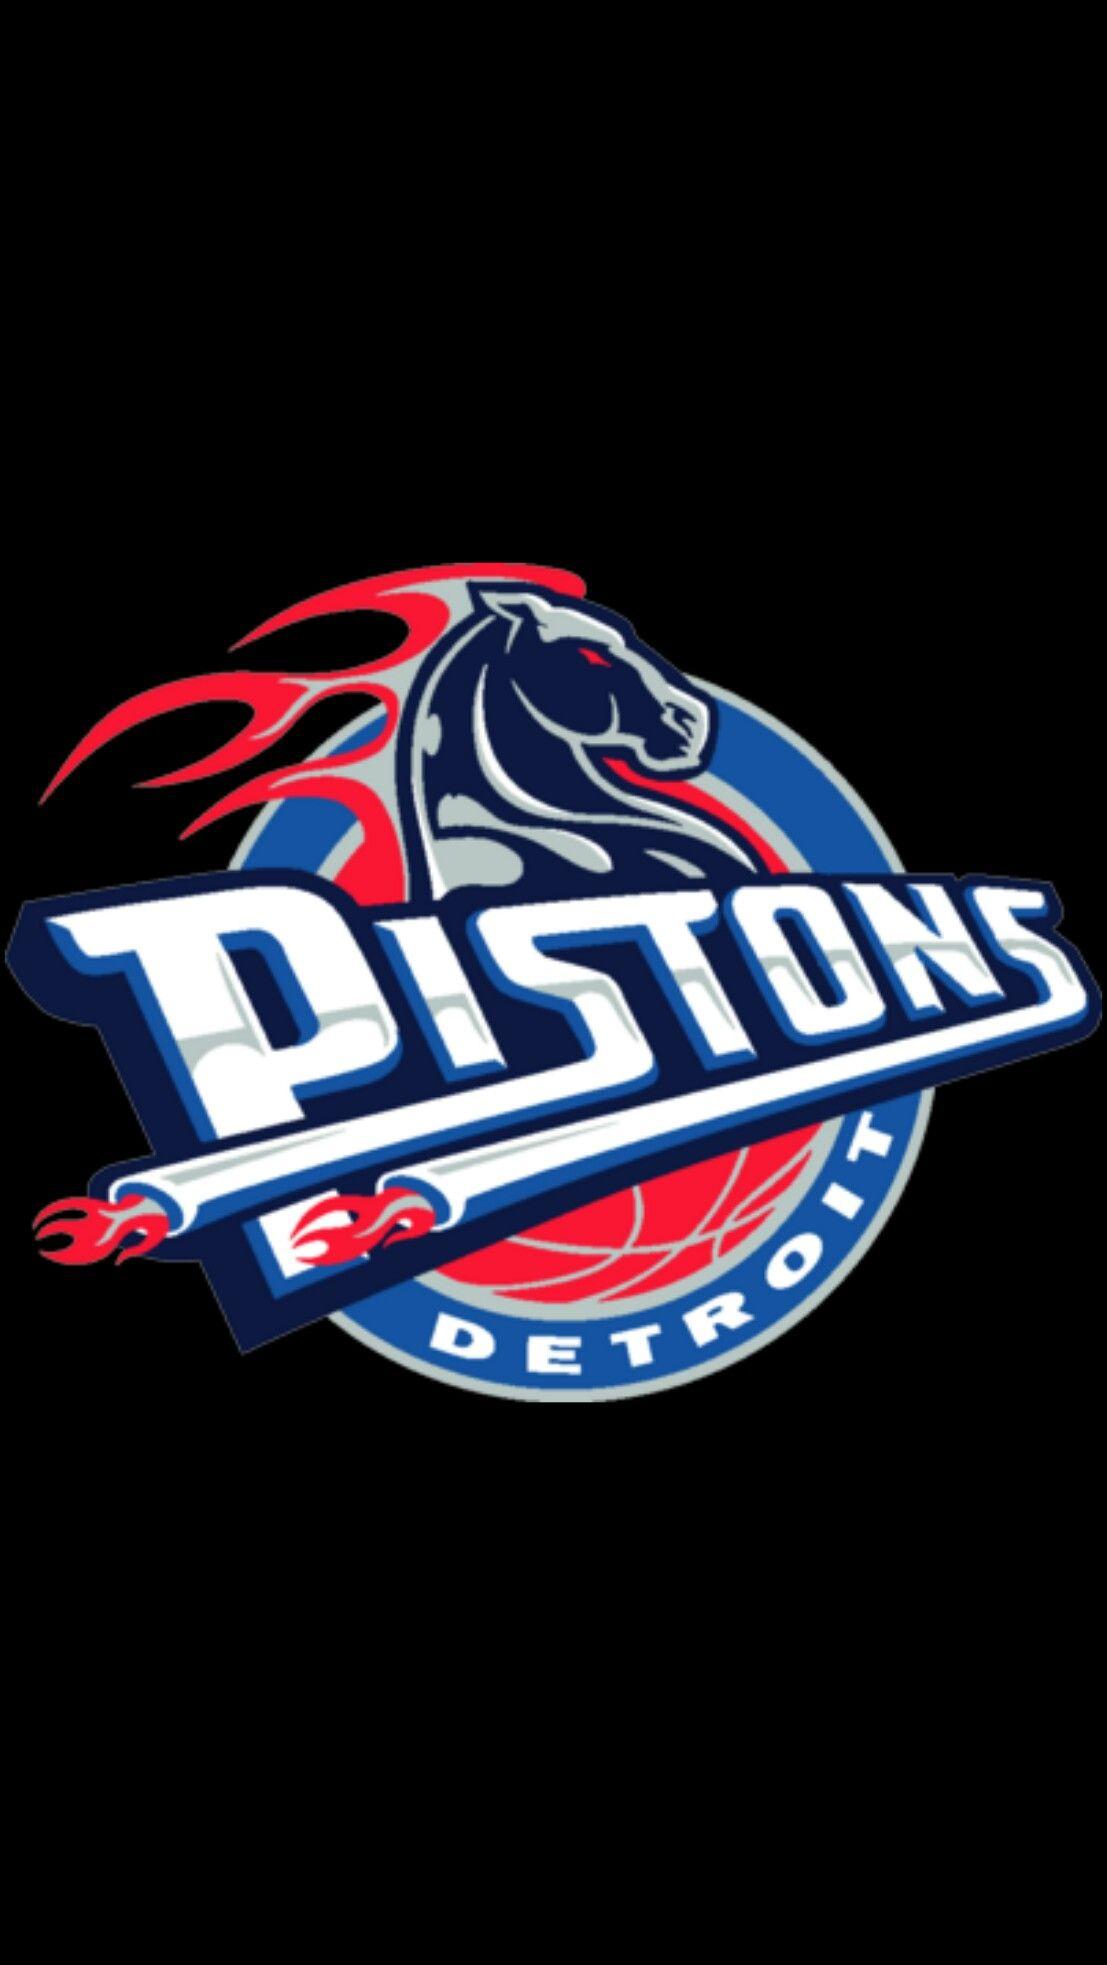 Nba Wallpaper Iphone Android Logo Basketball Pistons Logo Nba Logo